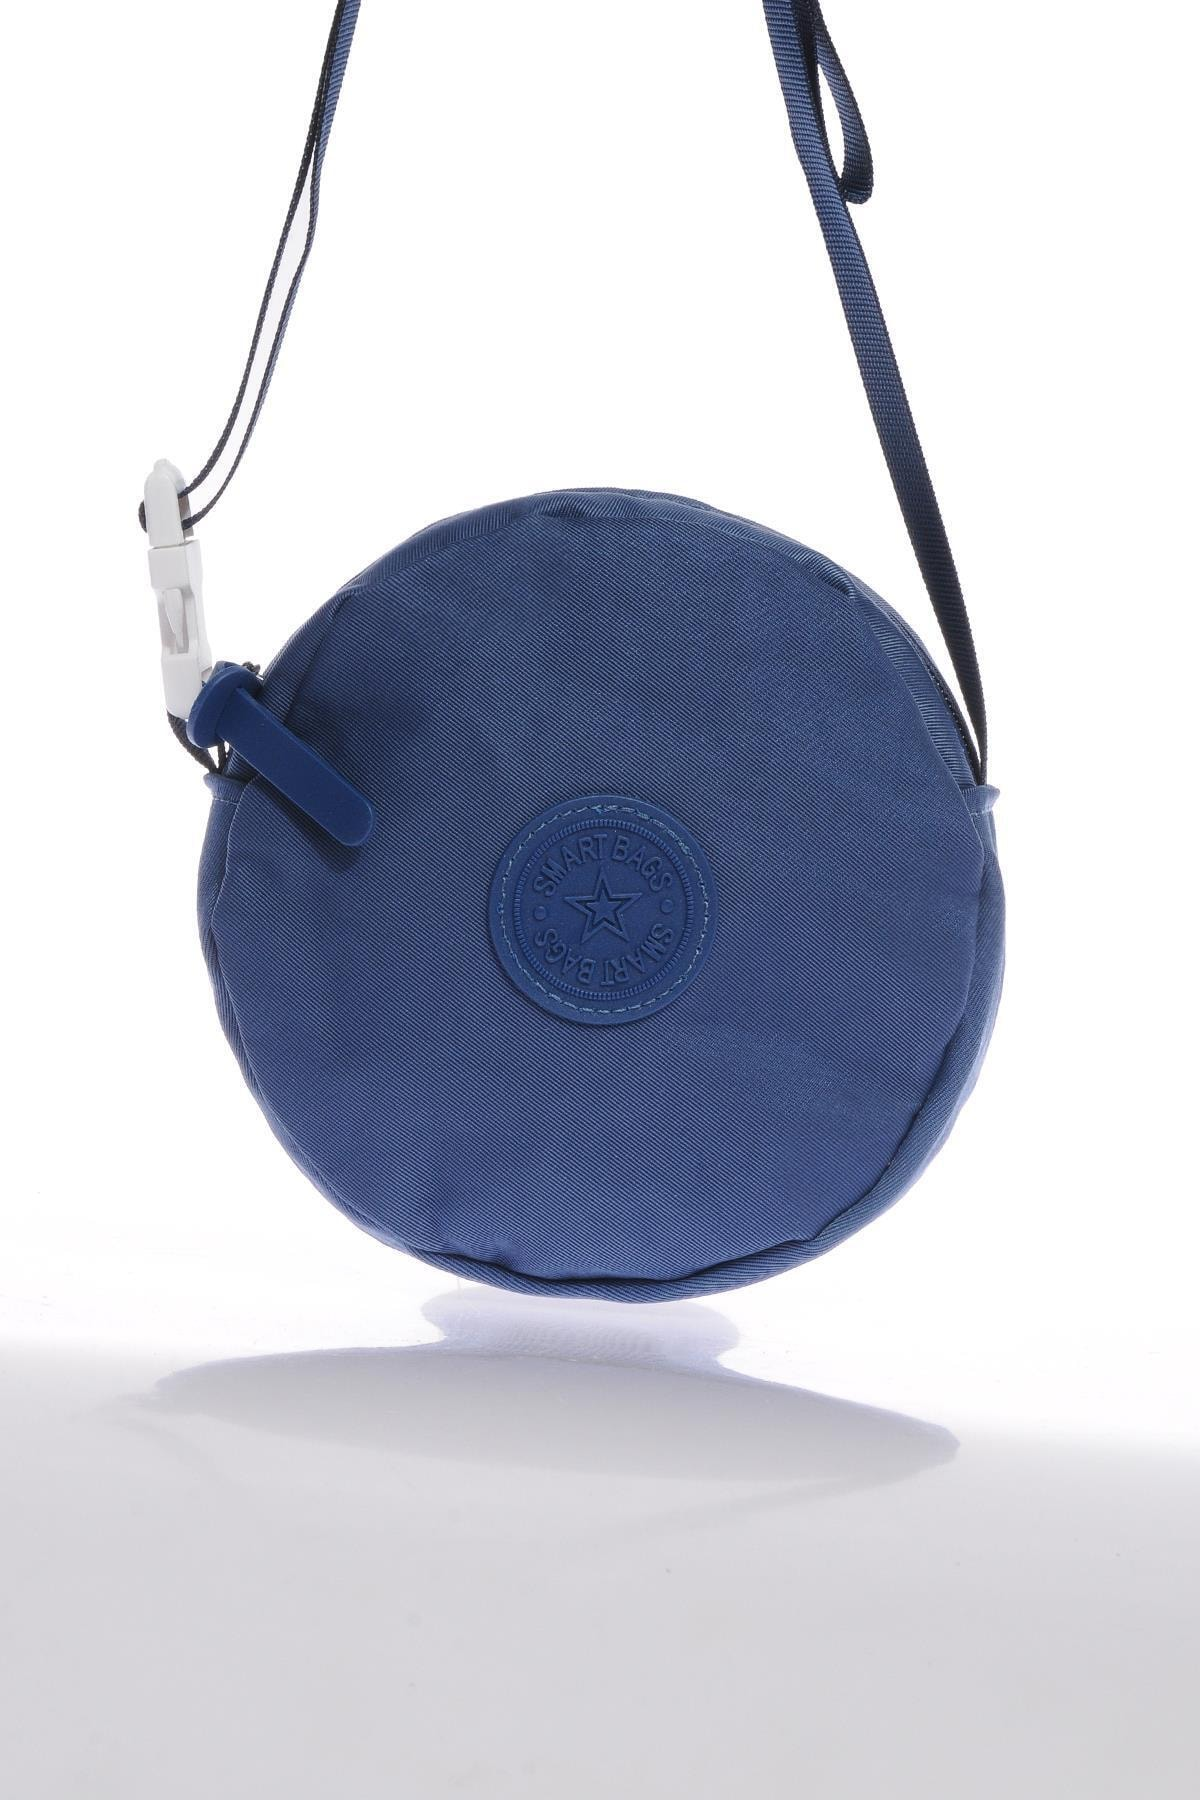 SMART BAGS Smb6001-0050 Buz Mavisi Kadın Minik Çapraz Çanta 1